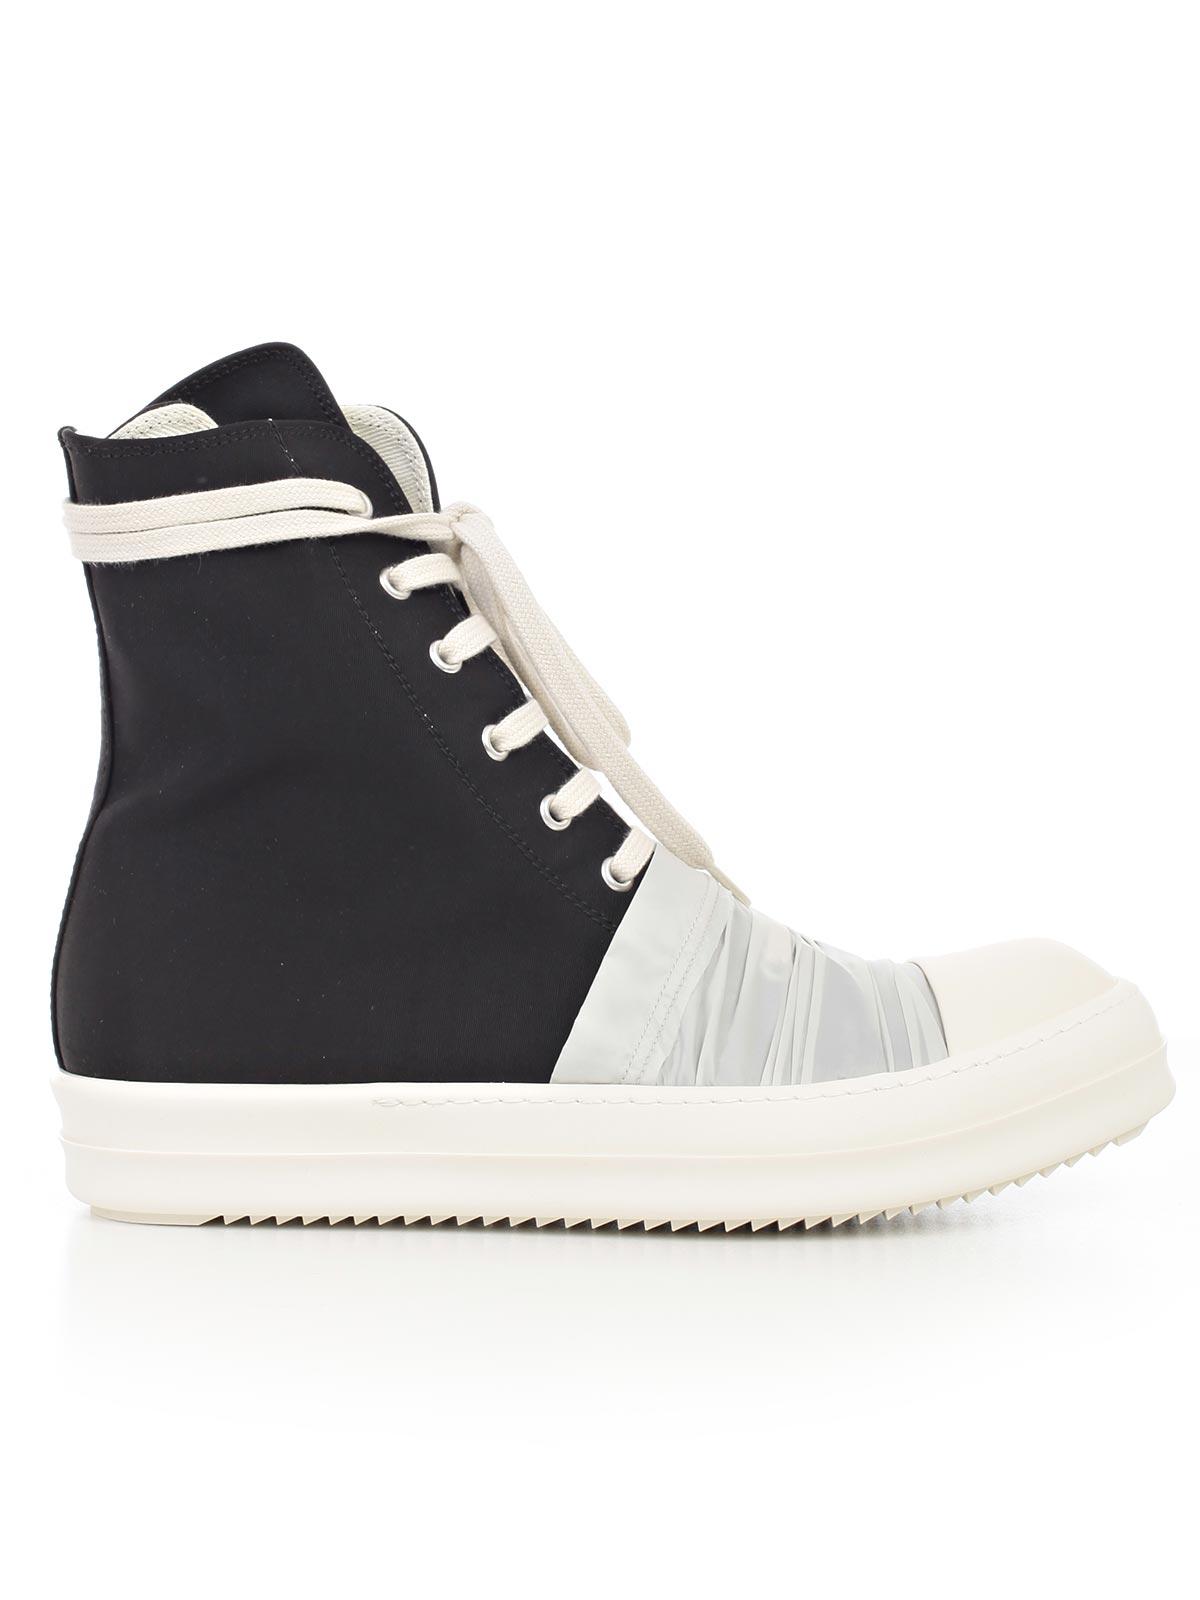 Picture of RICK OWENS DRKSHDW Sneakers